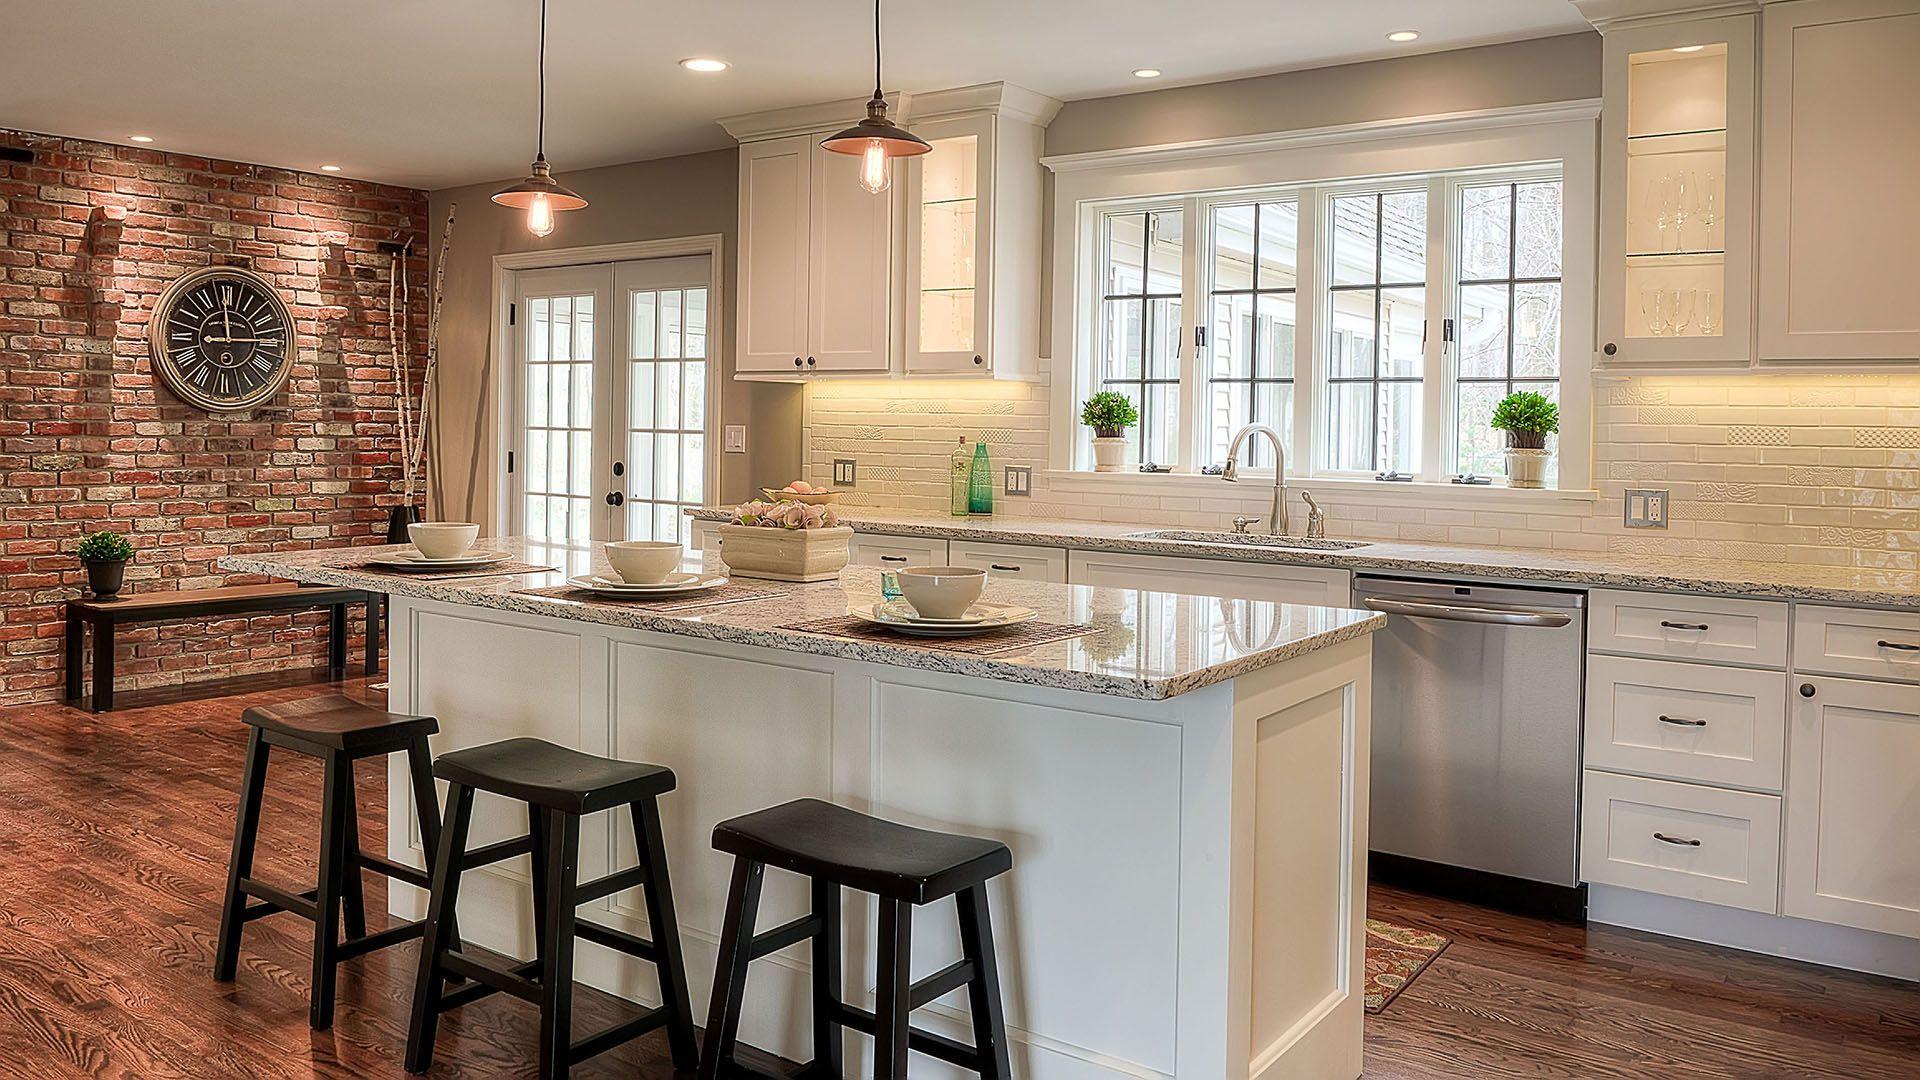 Kitchen Design Ideas Photos Of Remodeled Kitchens Kitchen Cabinet Door Styles Kitchen Design Kitchen Layout